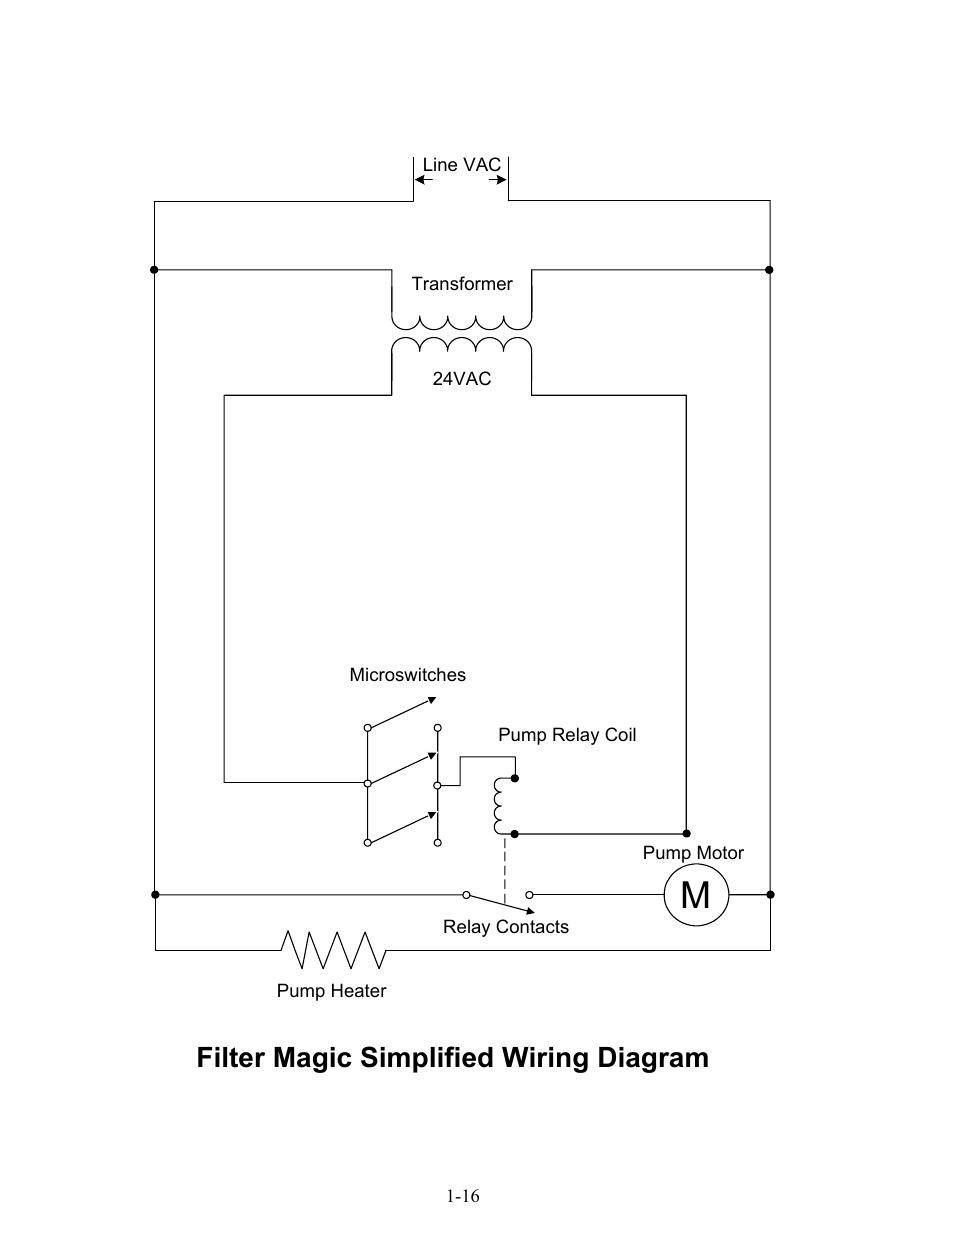 filter magic simplified wiring diagram frymaster h17 user manualfilter magic simplified wiring diagram frymaster h17 user